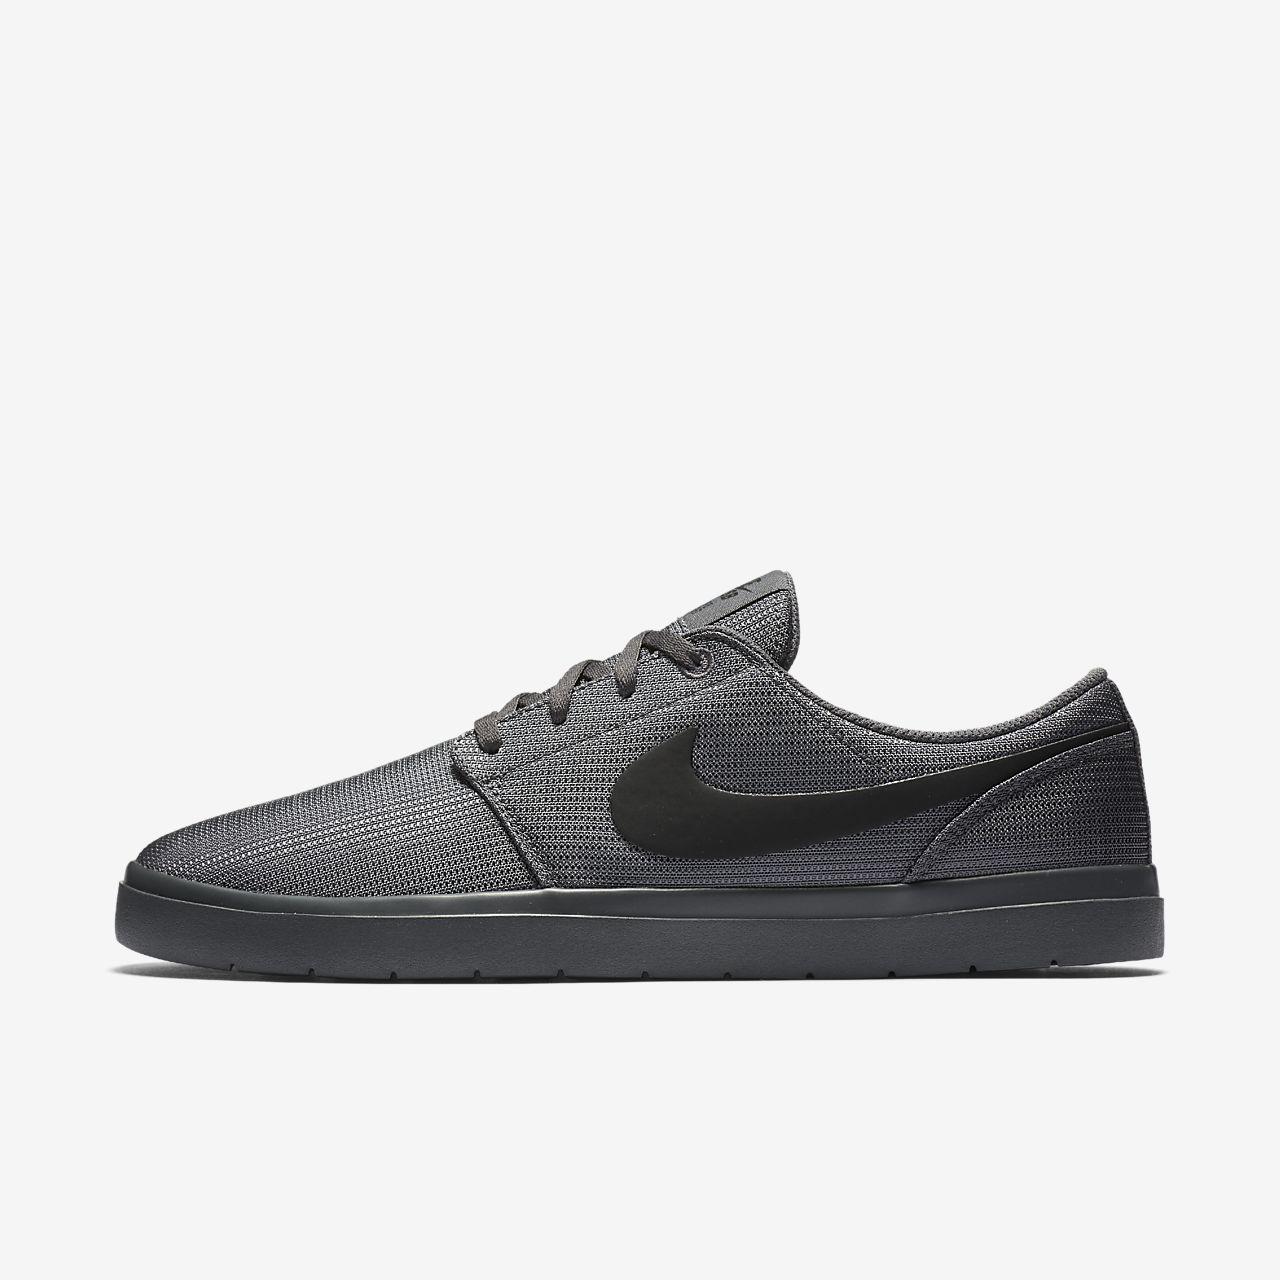 nike 6.0 trainers nike lifestyle shoes